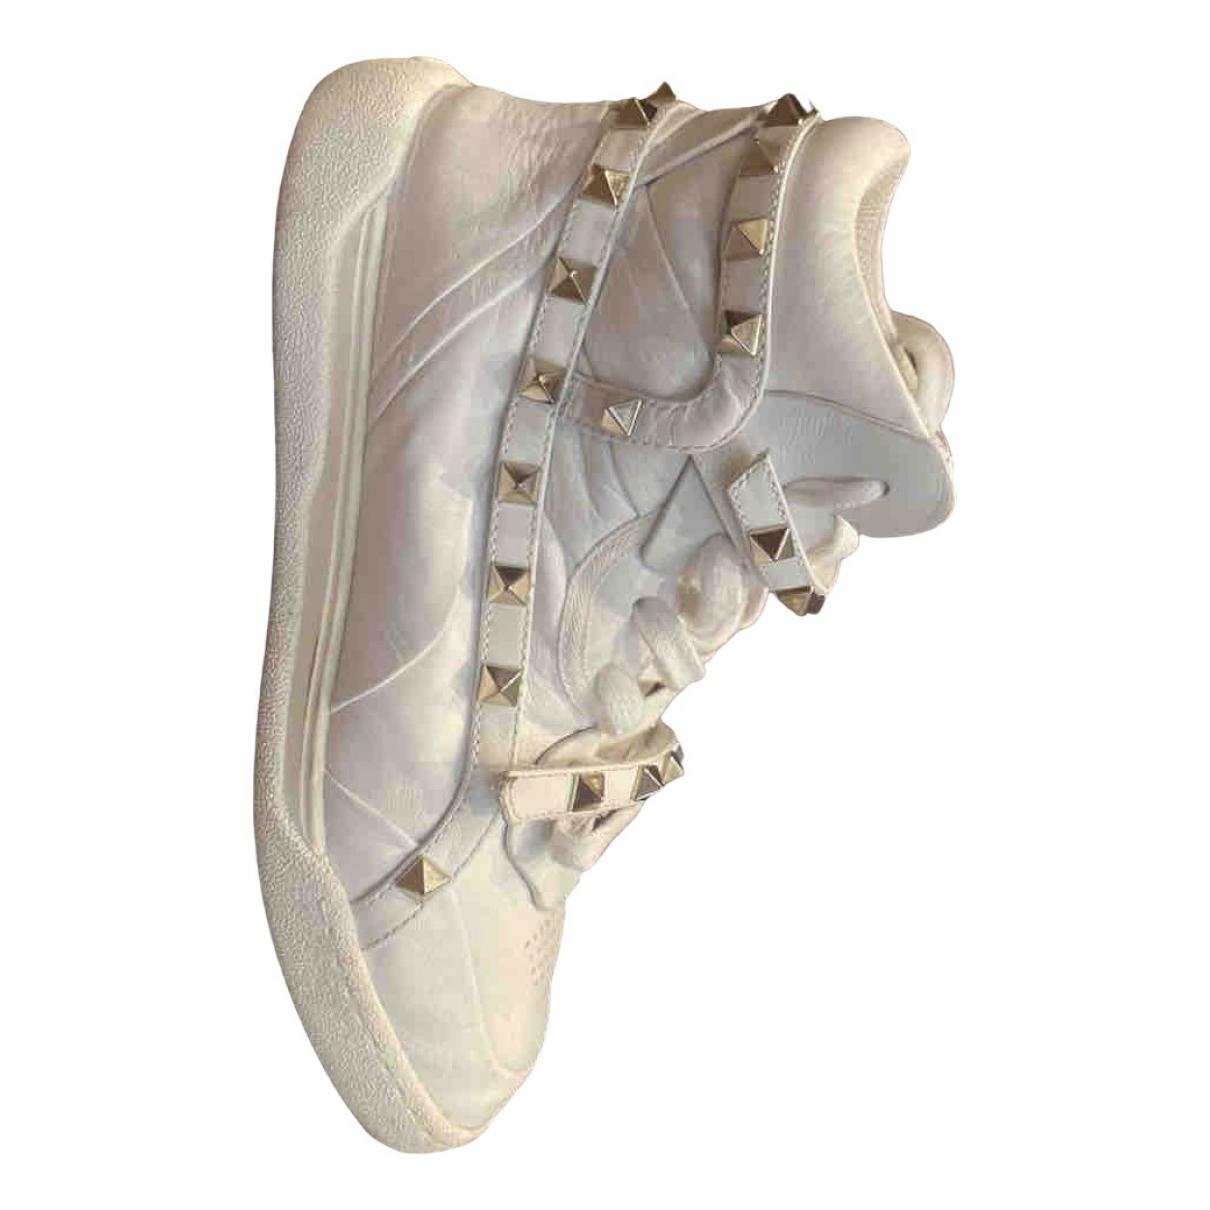 Valentino Garavani N White Leather Trainers for Women 35 EU